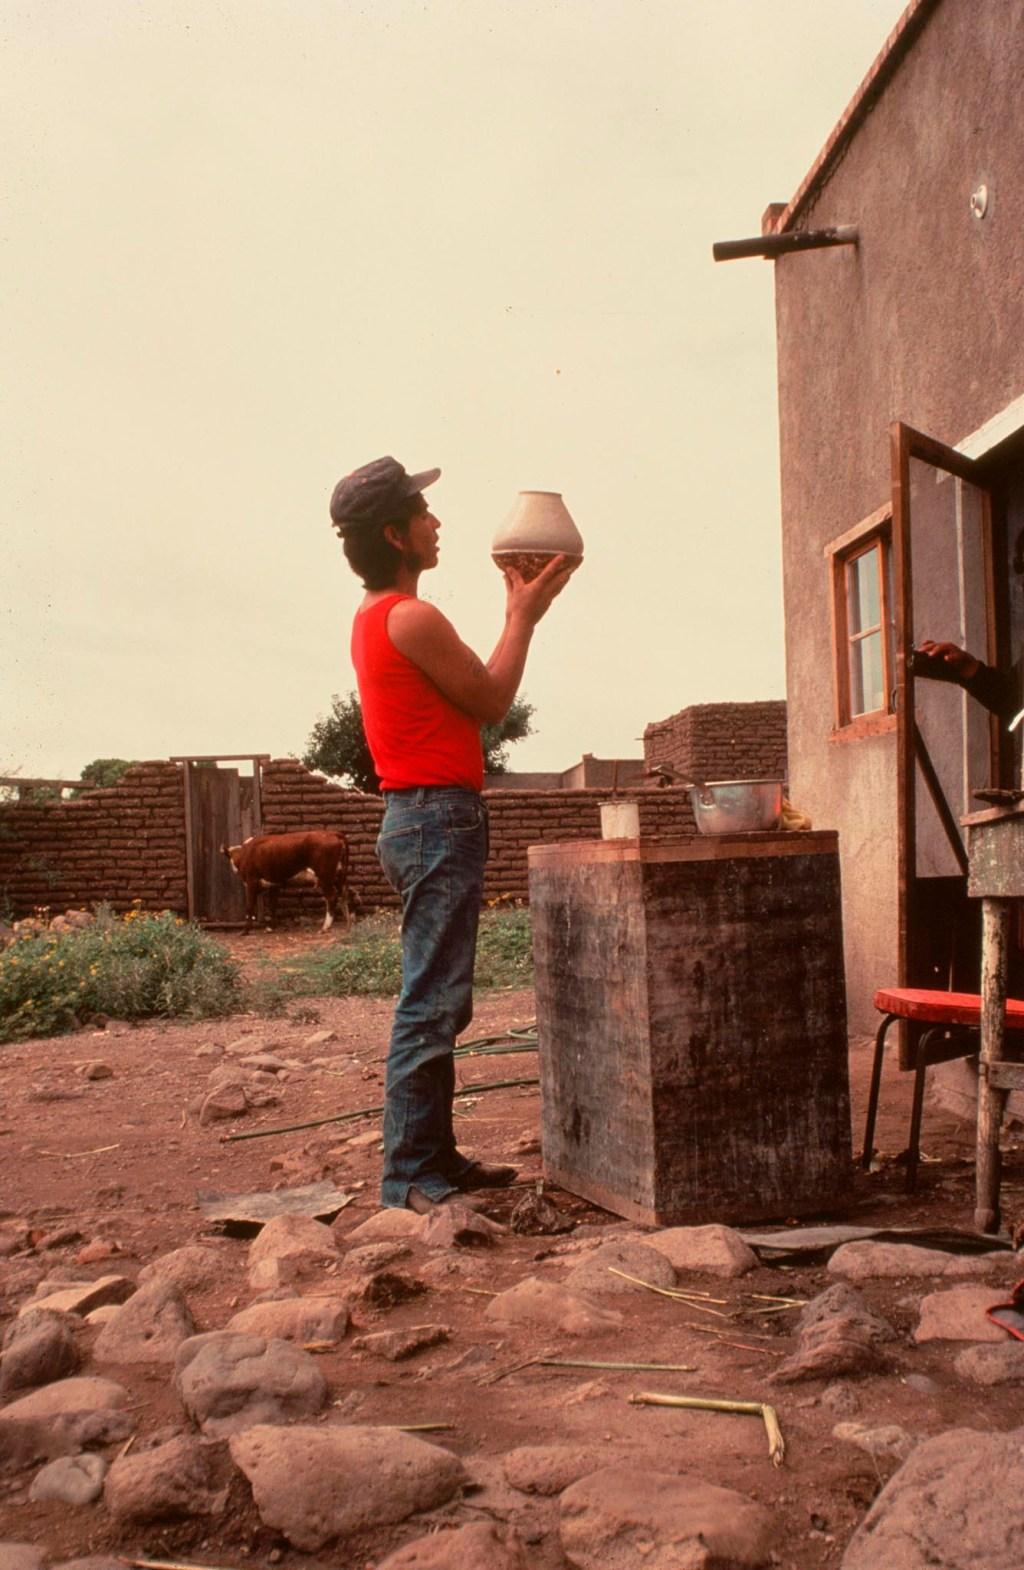 Islands in the Land Exhibition, The Rio Grande, Maker, Craft in America